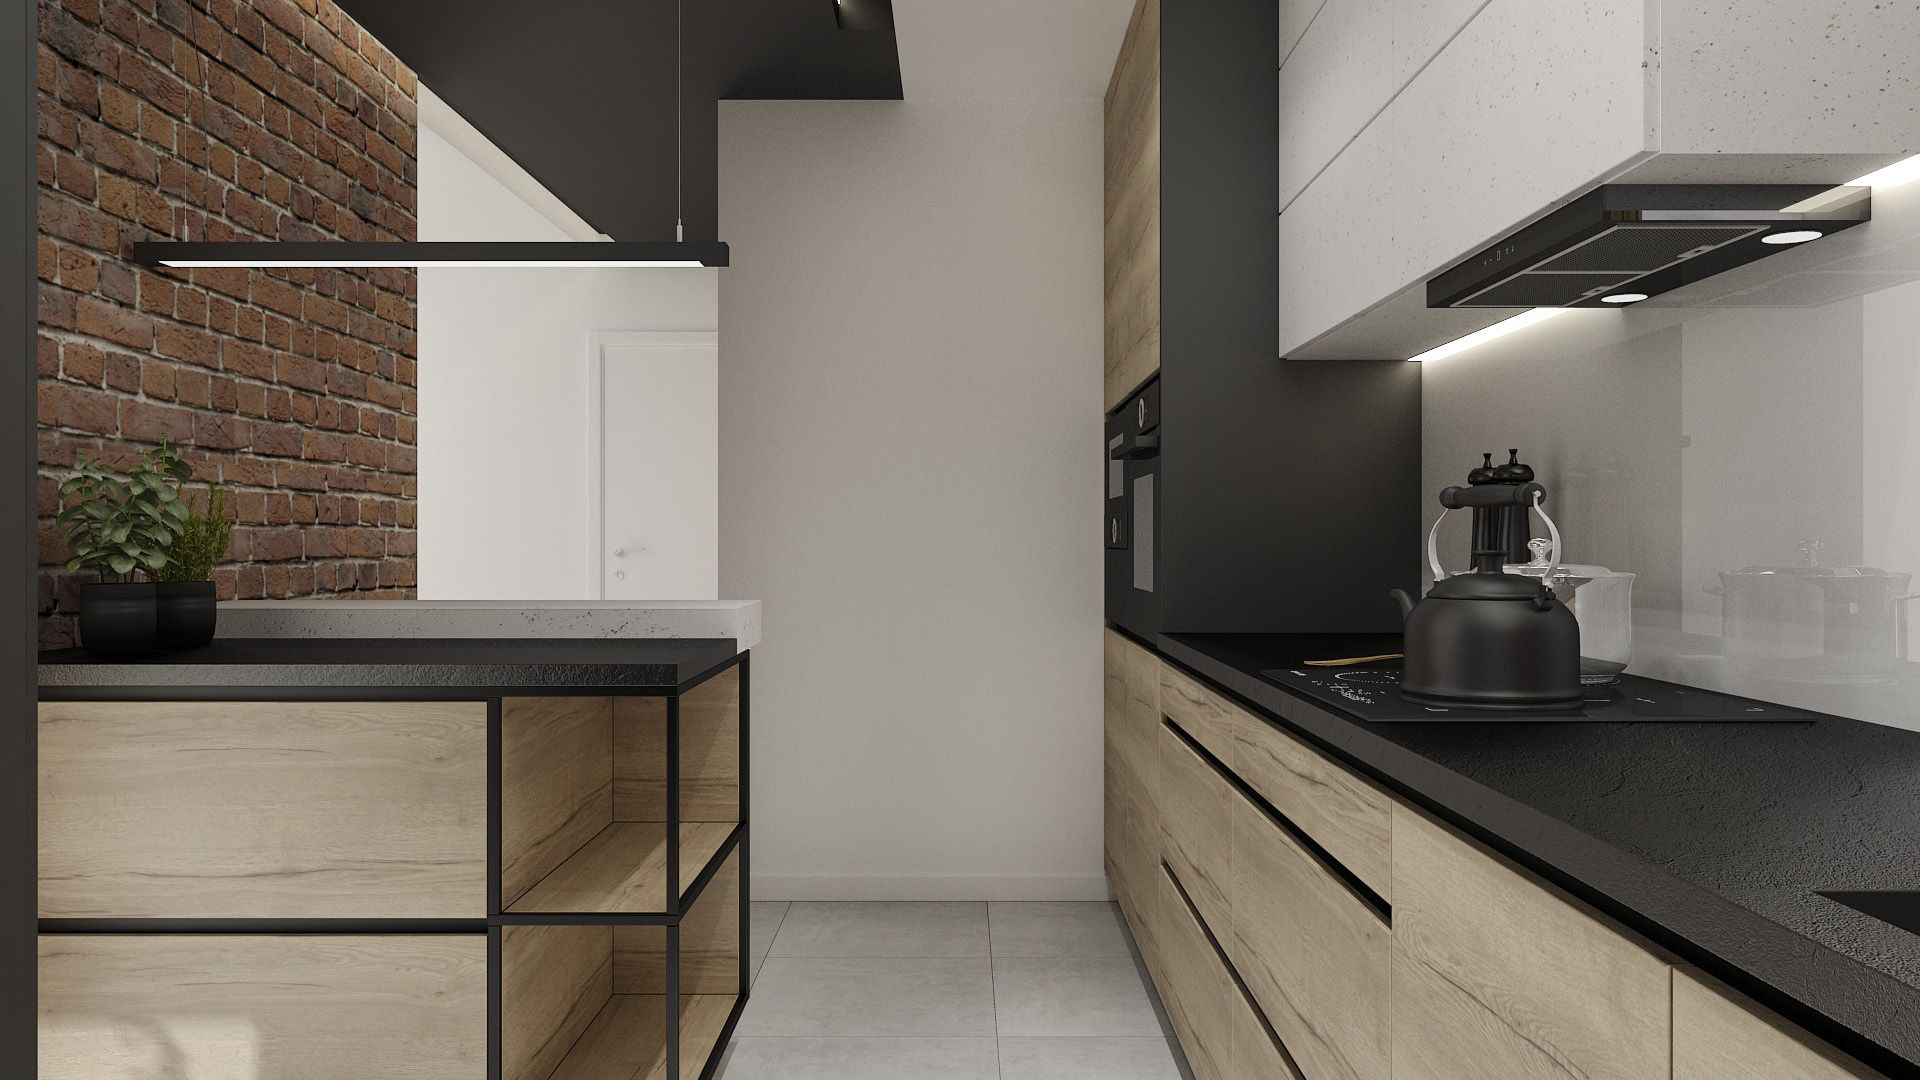 Nowoczesna Kuchnia Z Wyspa Kitchen Cabinets Kitchen Home Decor